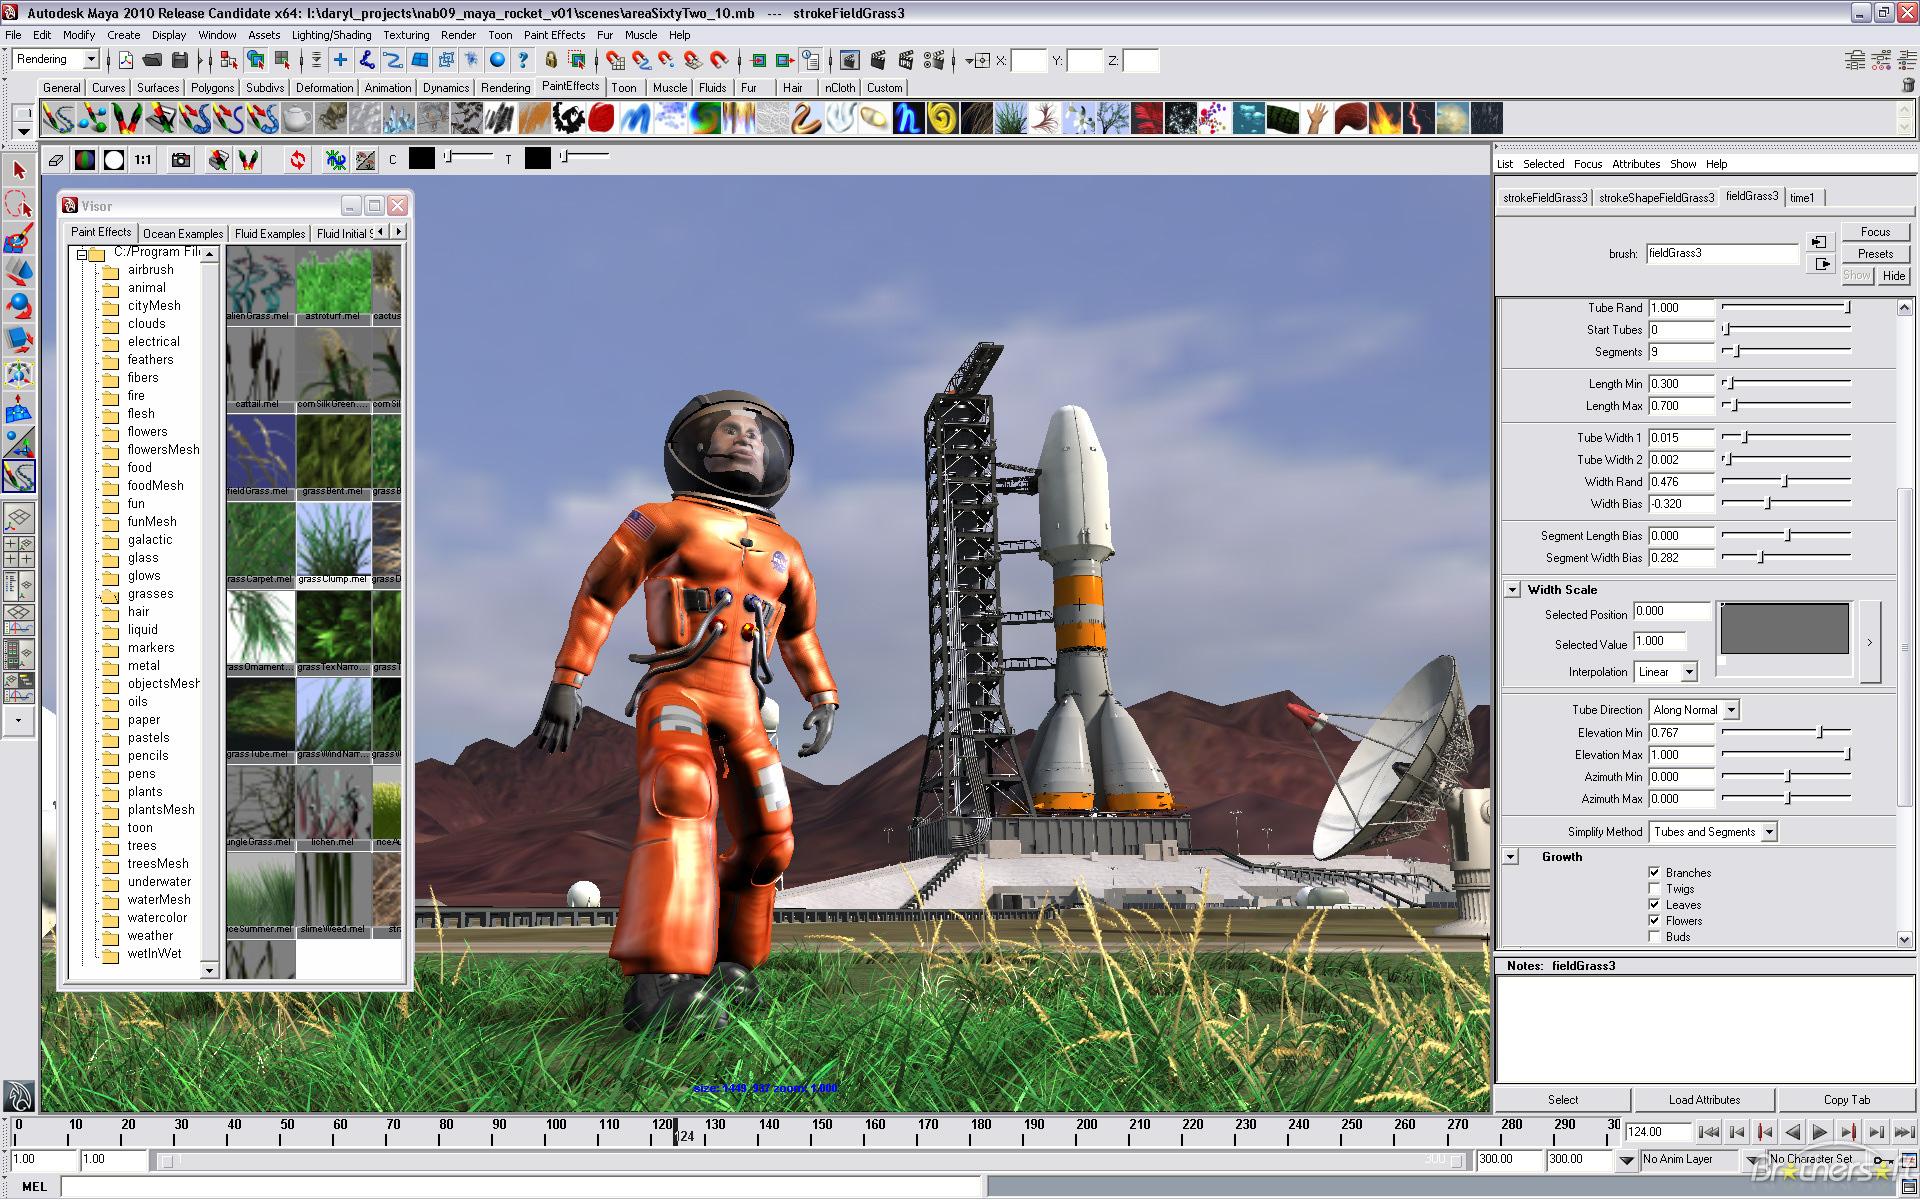 ~/vDocuments/Education/Pic/ab1f70dc-b0c6-40c4-85f2-cd26fac18163.jpeg